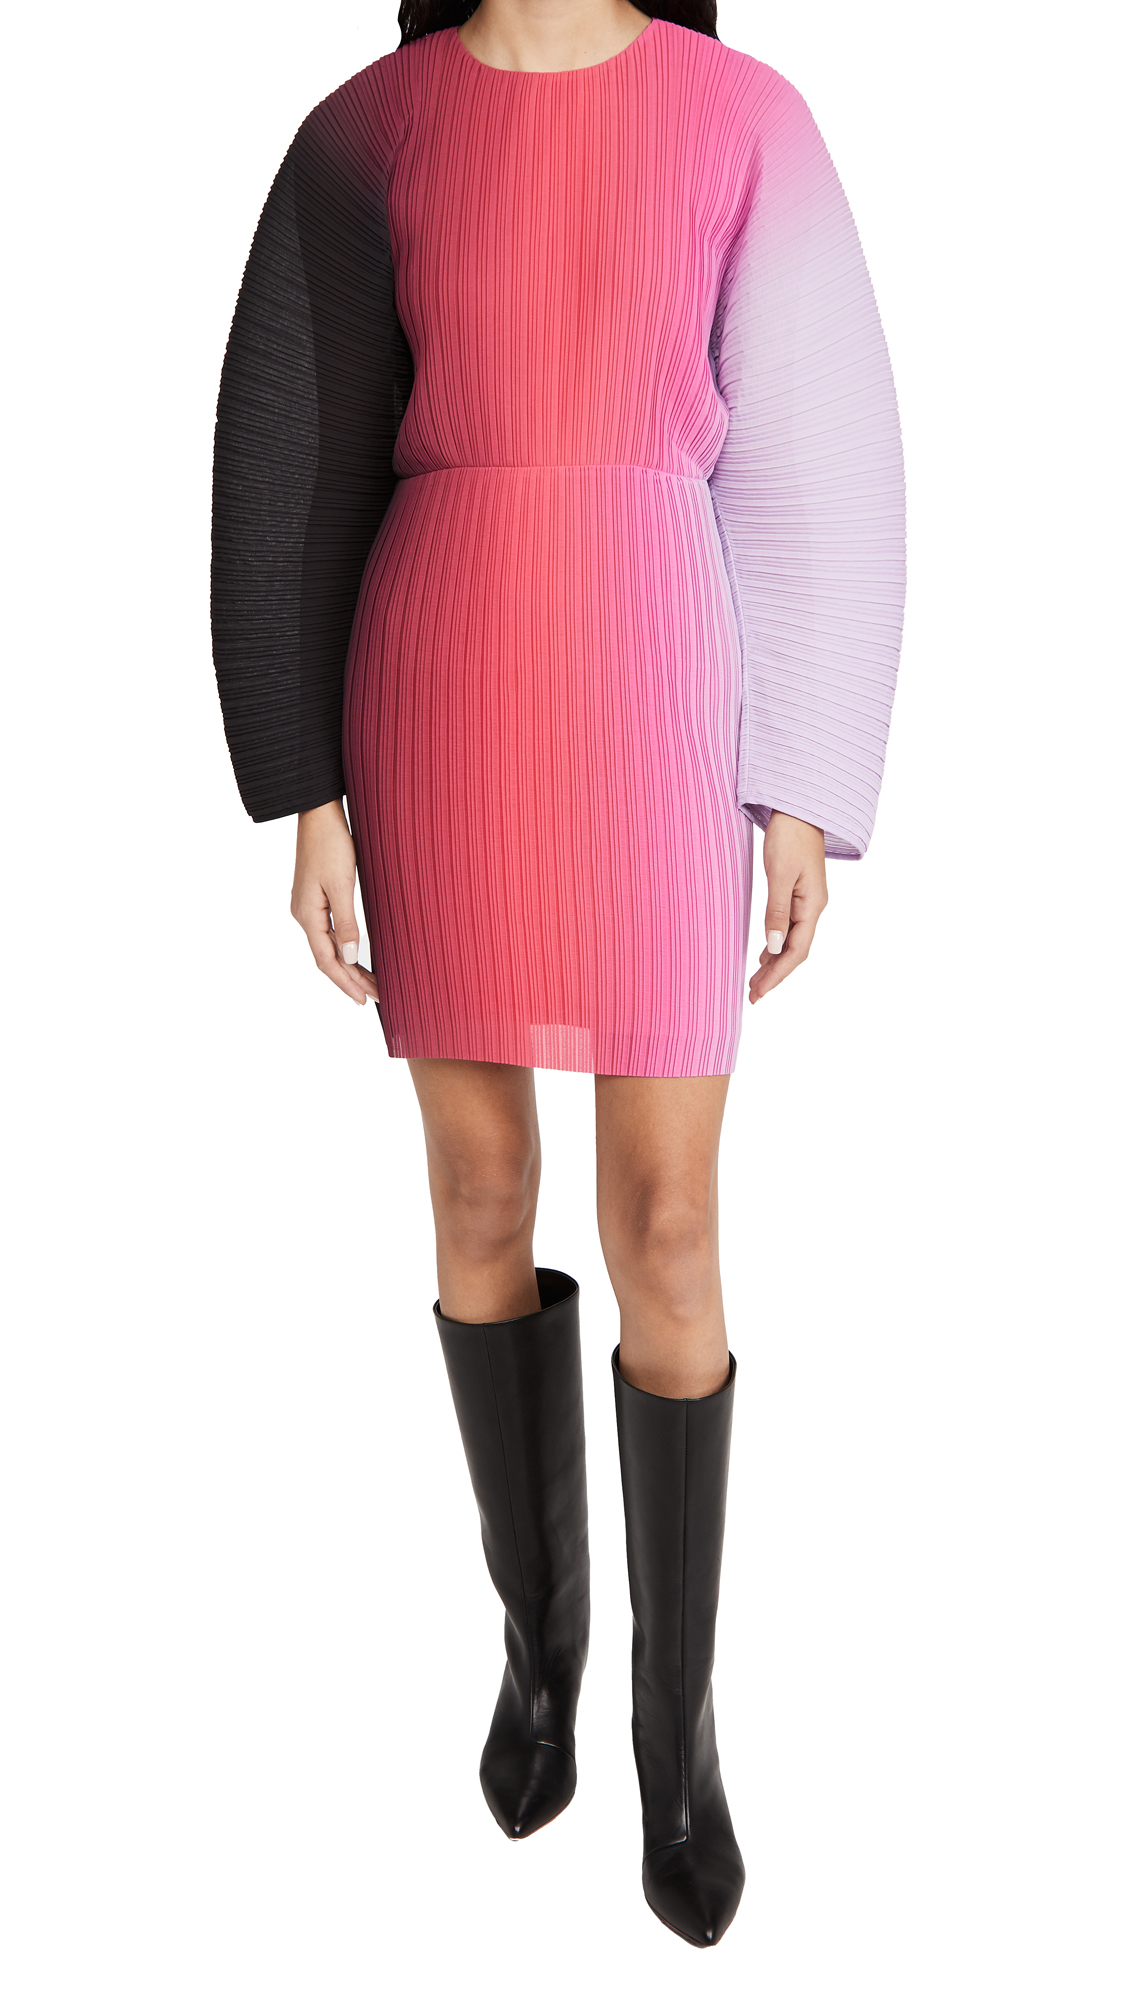 Solace London Mira Mini Dress